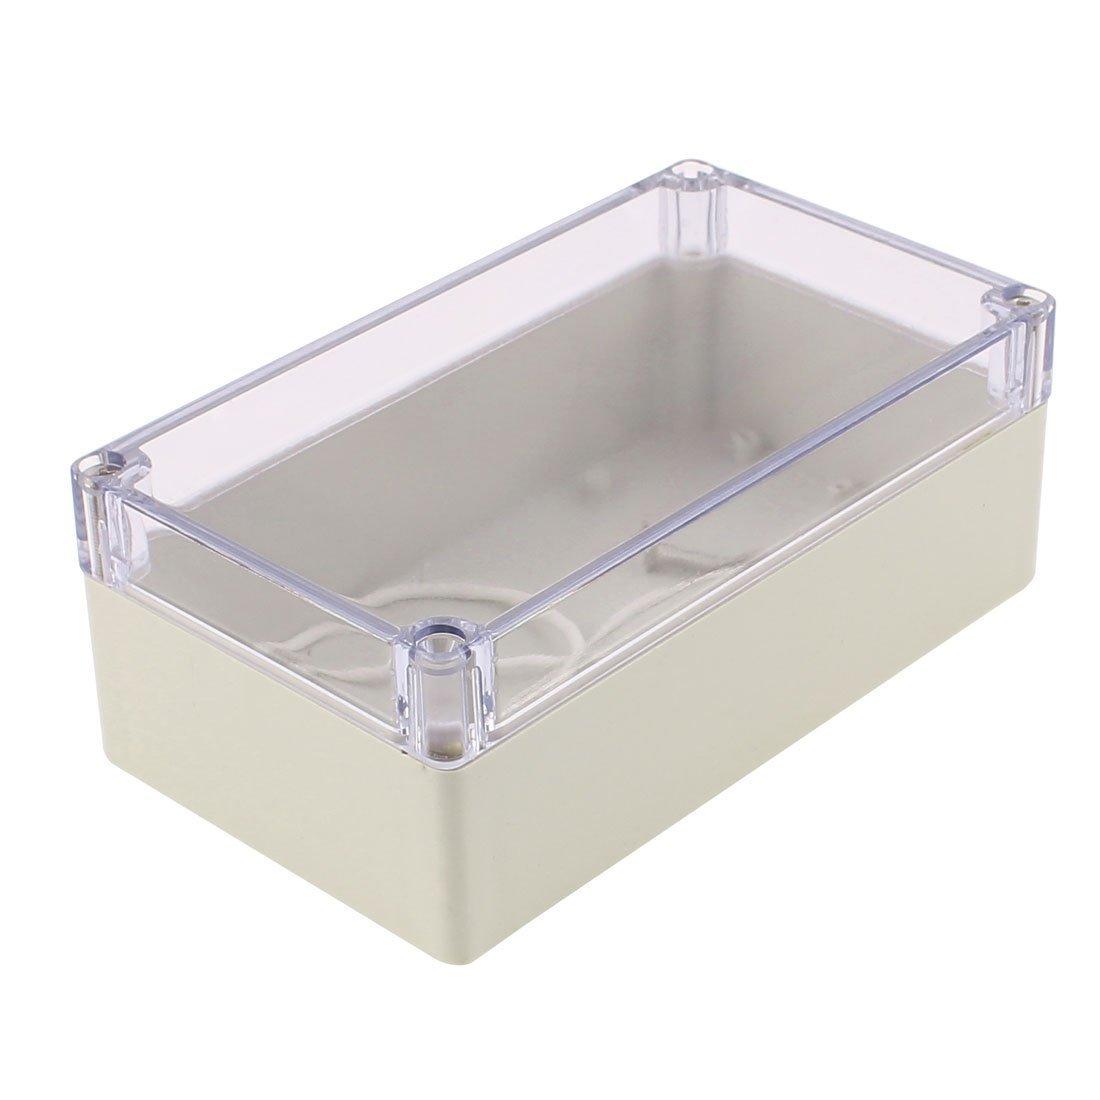 sourcingmap® 158 x 90 x 60mm Transparent Cover Dustproof IP65 Junction Box Terminal Box Enclosure a16081200ux0666